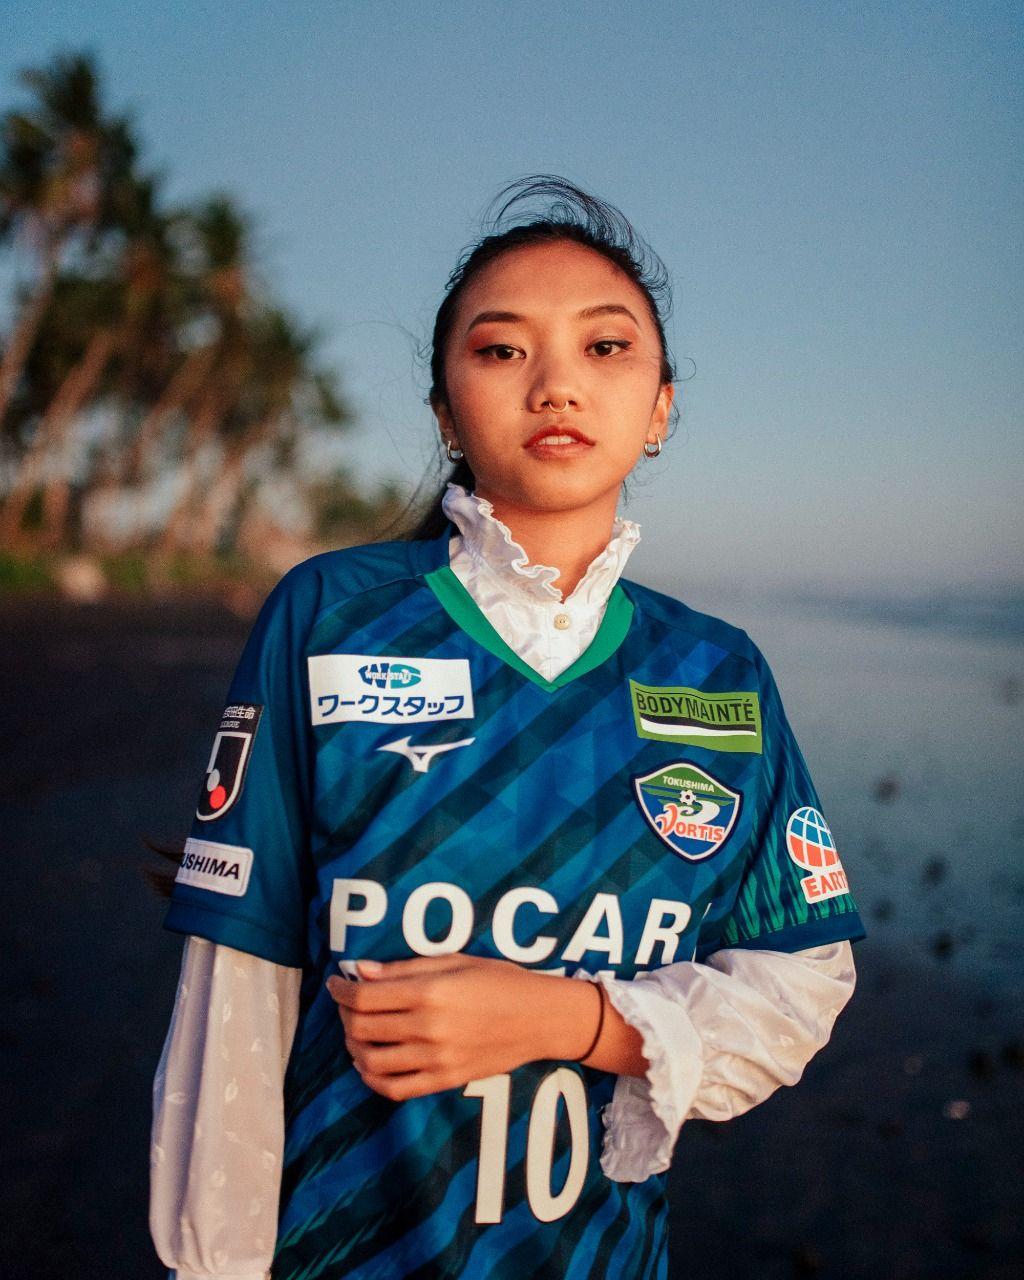 Dari Bali untuk J.League - 20J1: Dimainkan di Jepang, Dibuat oleh Dunia.